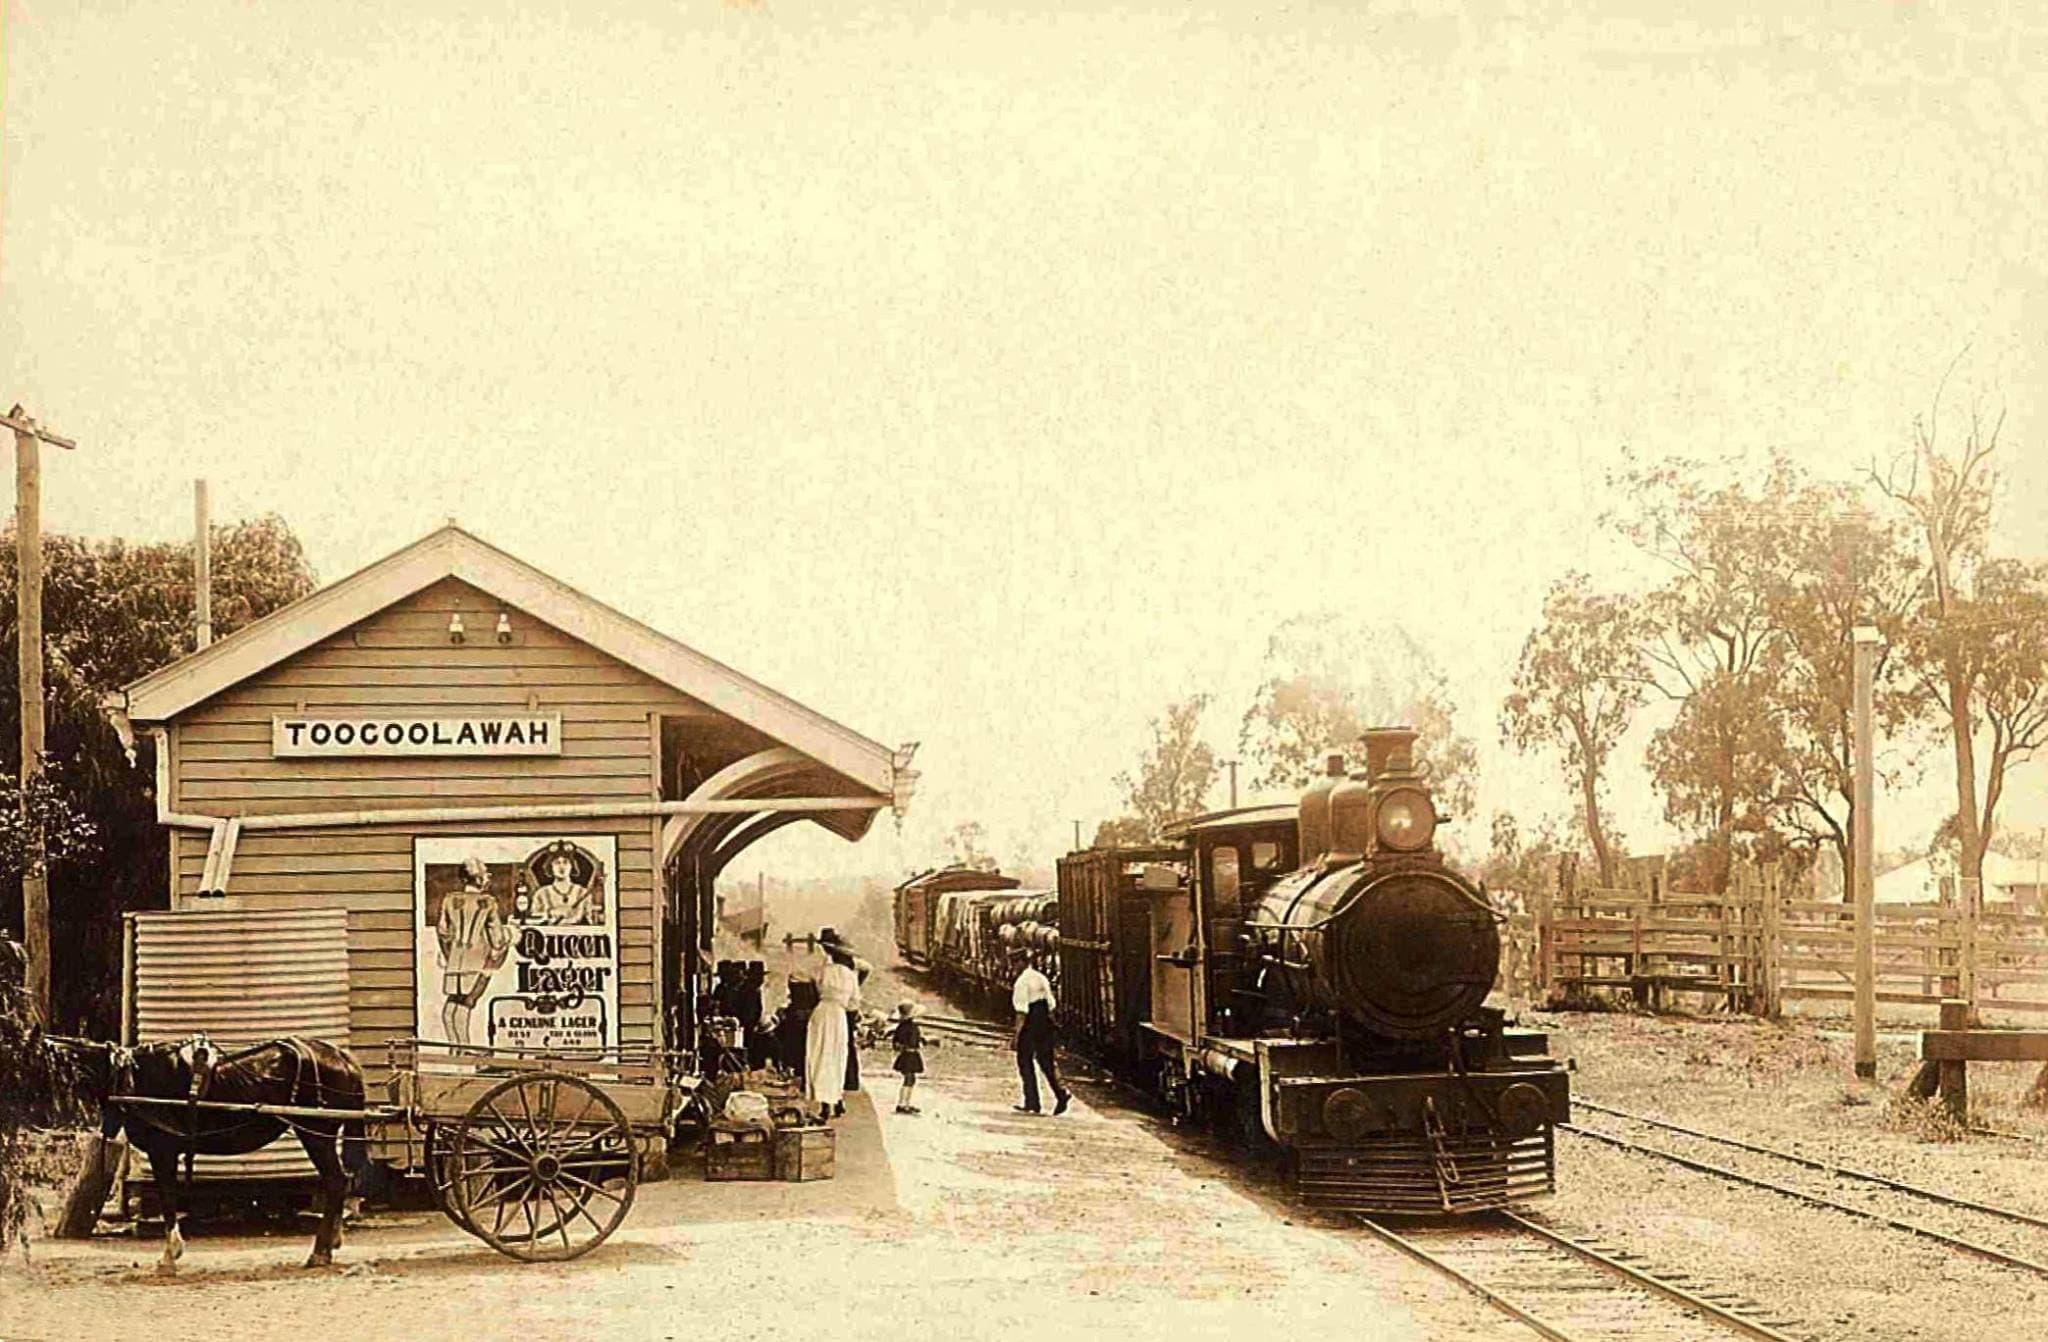 Toogoolawah Station